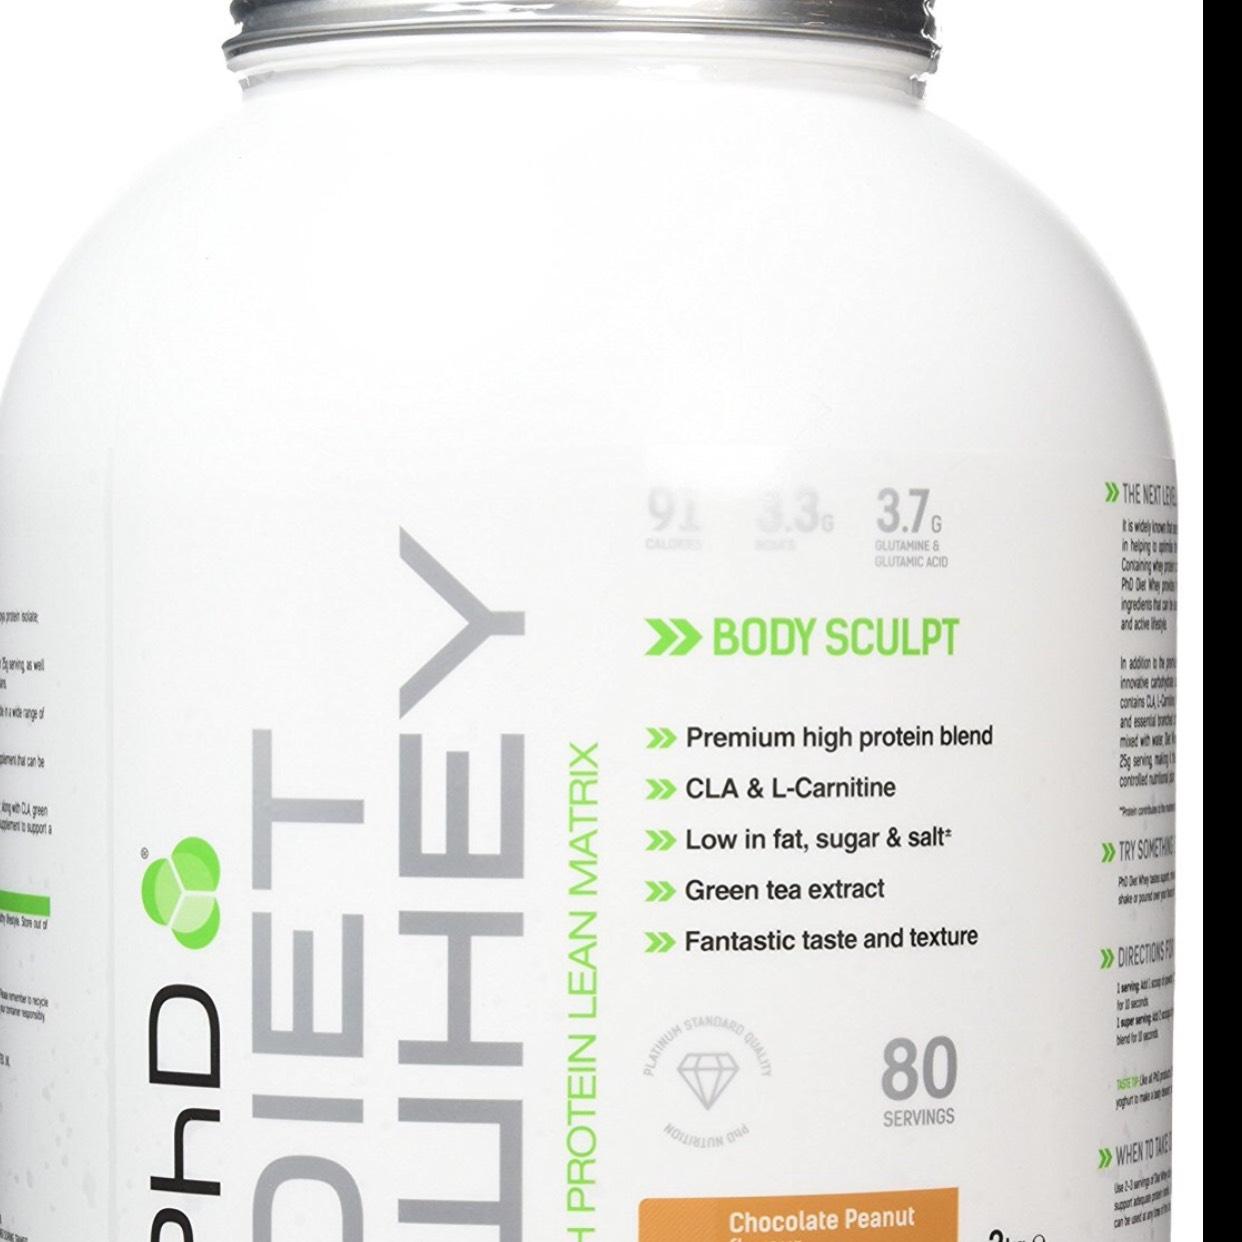 PhD Nutrition Diet Whey Protein Powder - 2 kg, Chocolate Peanut £14.99 prime / £19.74 non prime @ Amazon